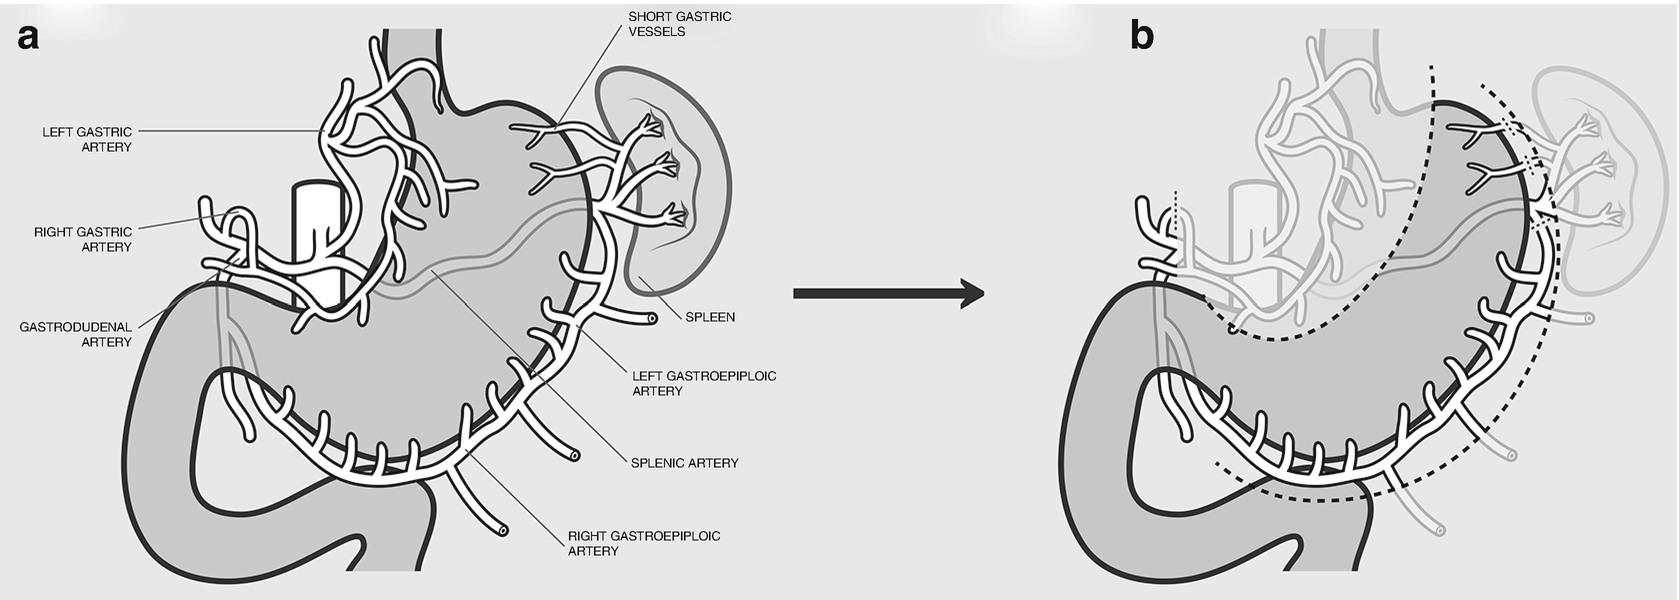 Esophageal Anatomy | SpringerLink